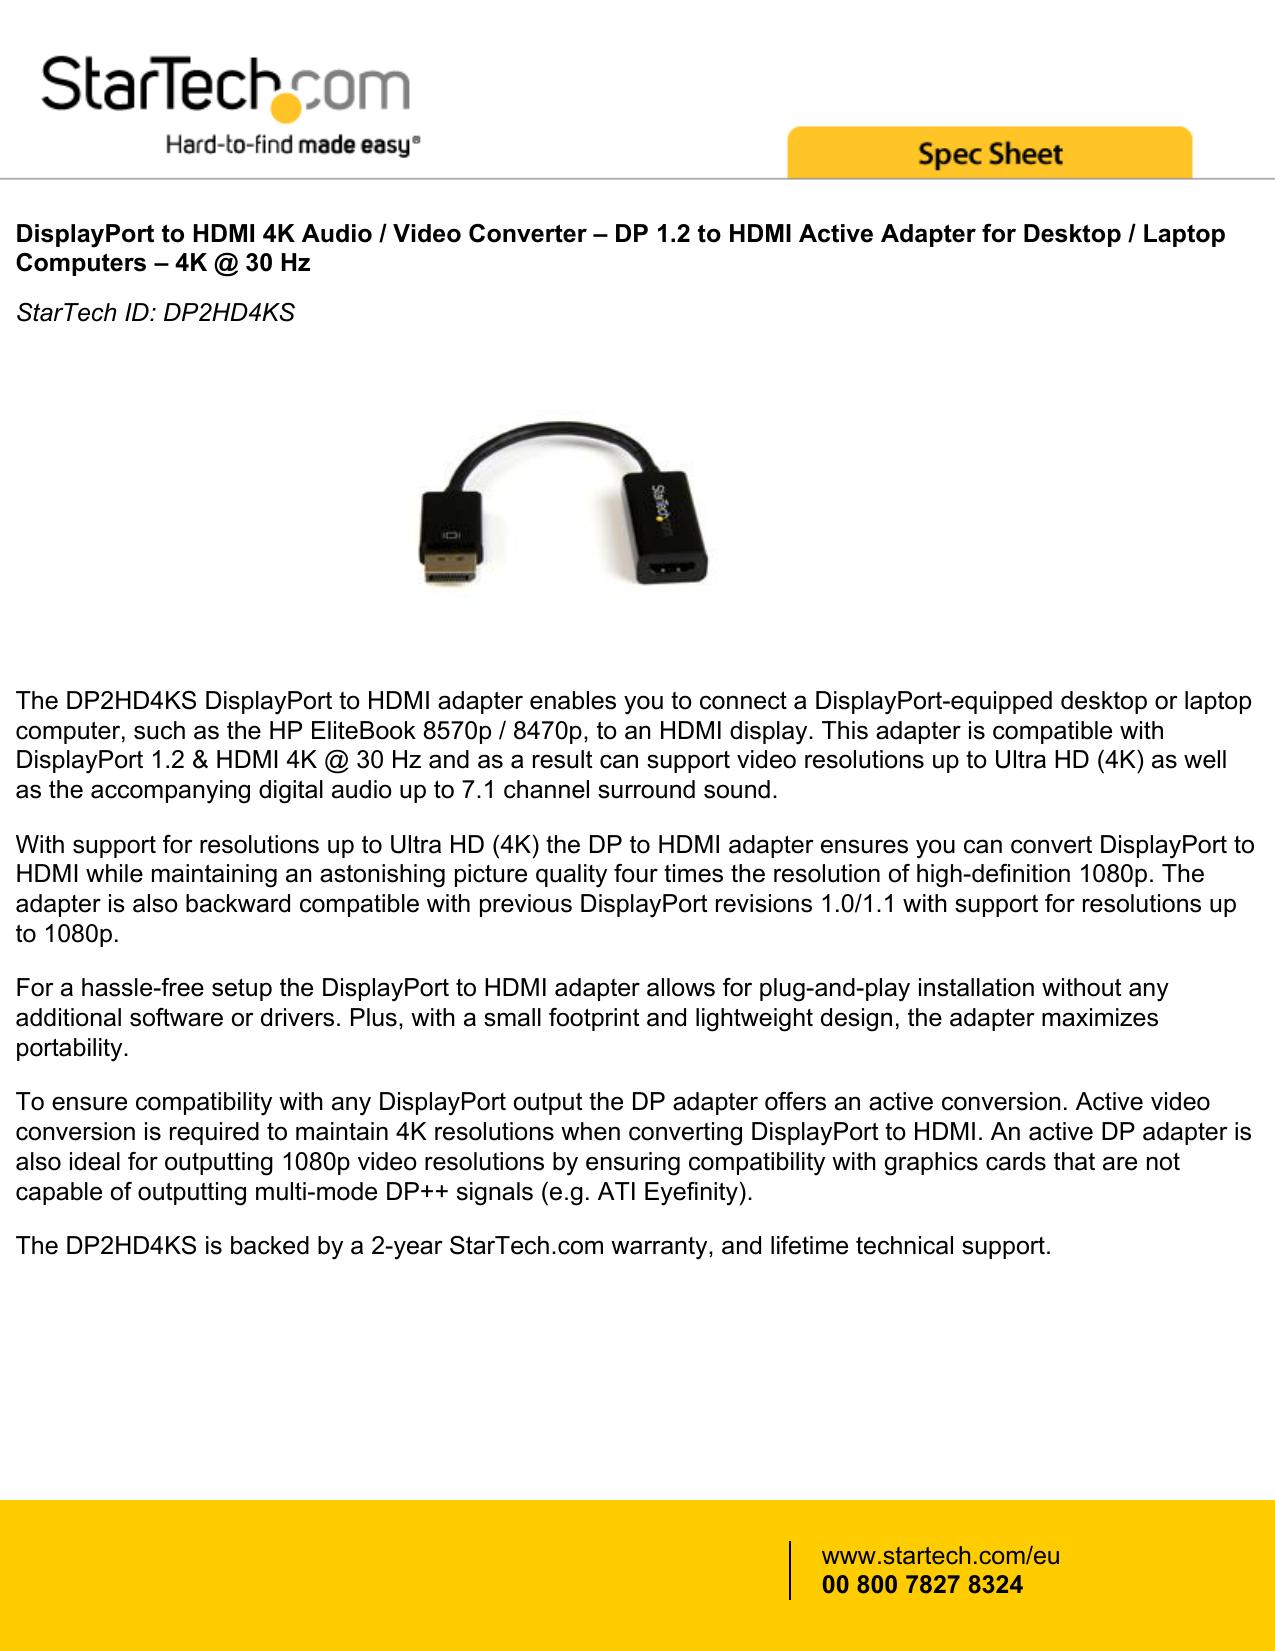 DisplayPort to HDMI 4K Audio / Video Converter | manualzz com